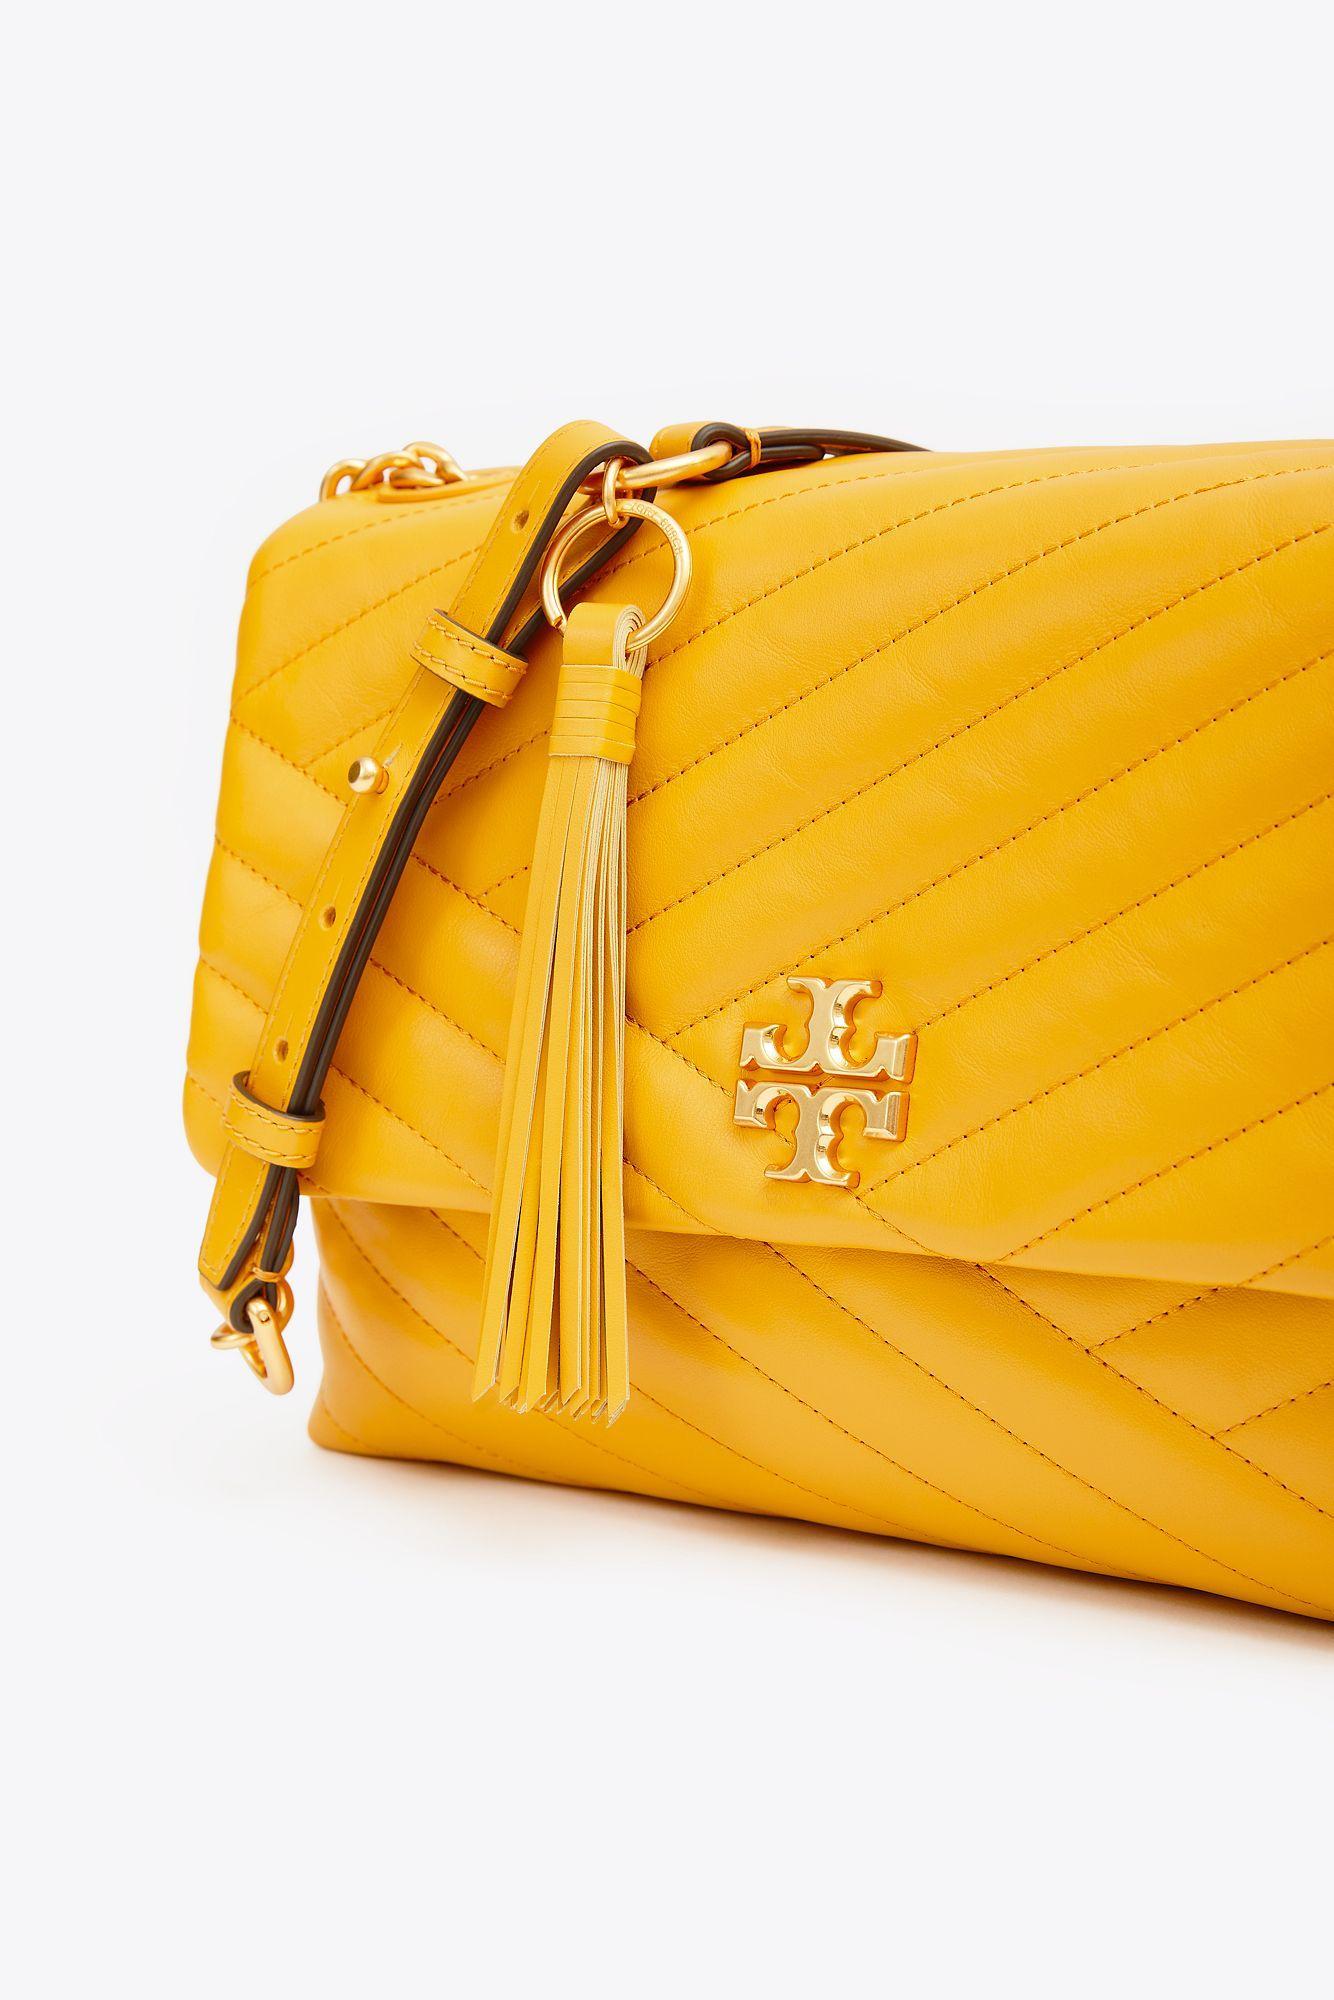 0c0ad8389dbf Tory Burch Kira Chevron Flap Shoulder Bag in Yellow - Lyst